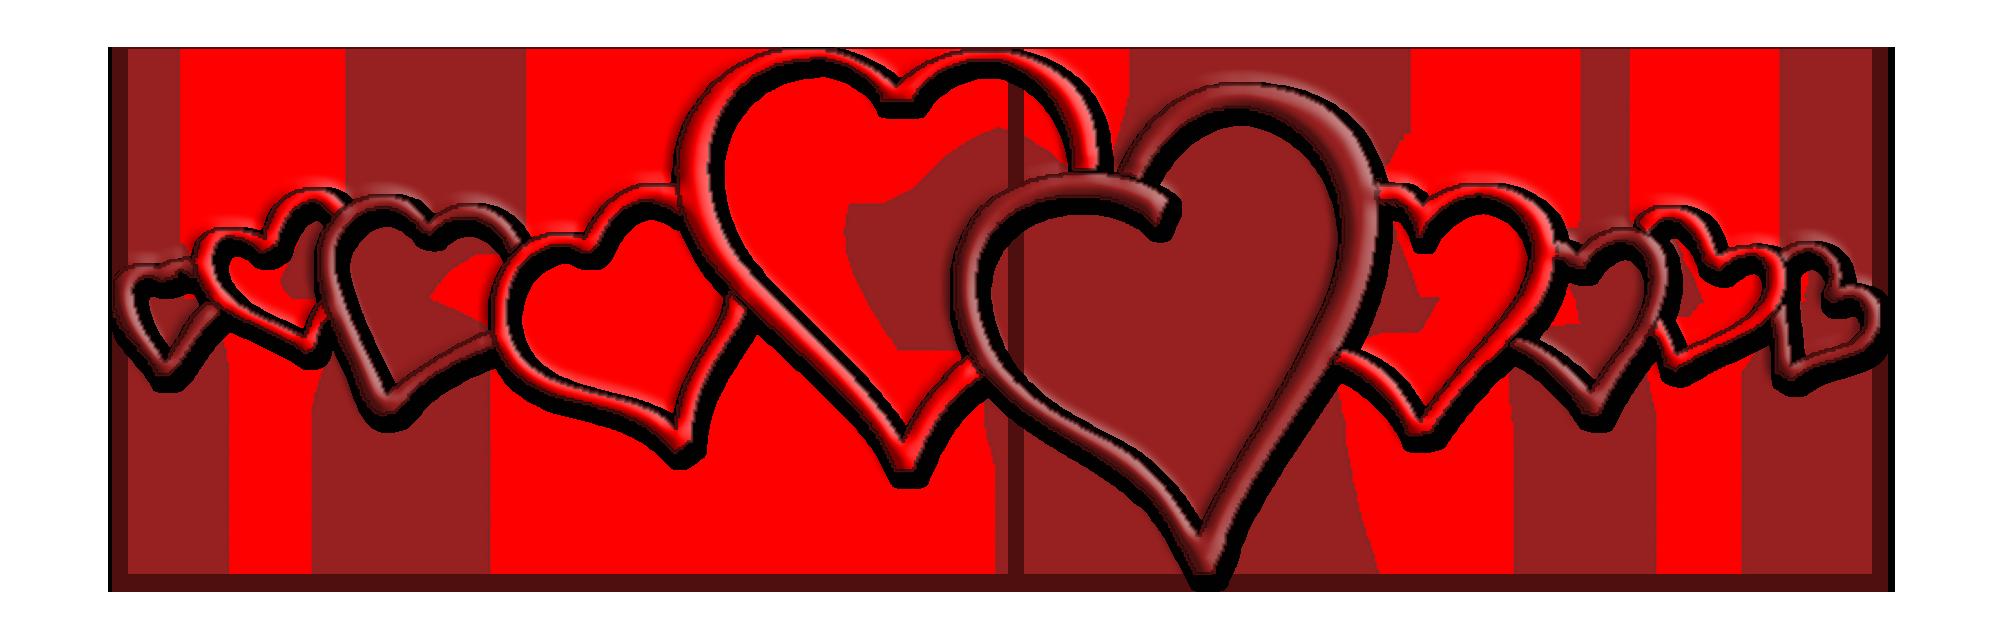 Hearts in a row. Heat clipart hears